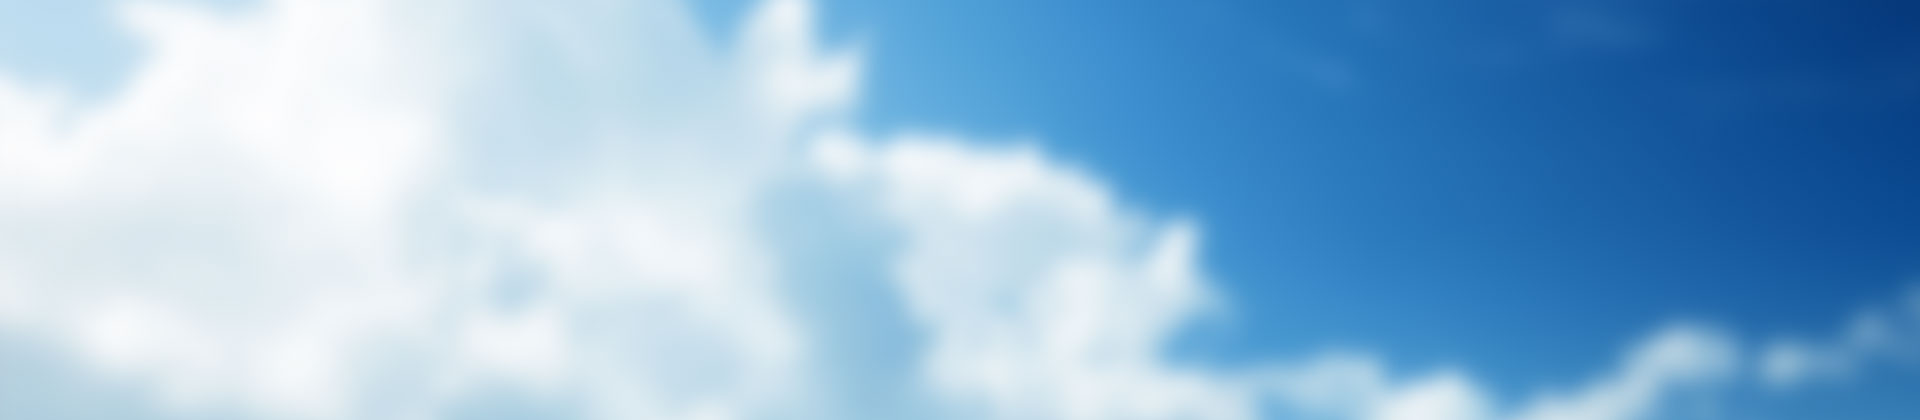 backdrop_cloud